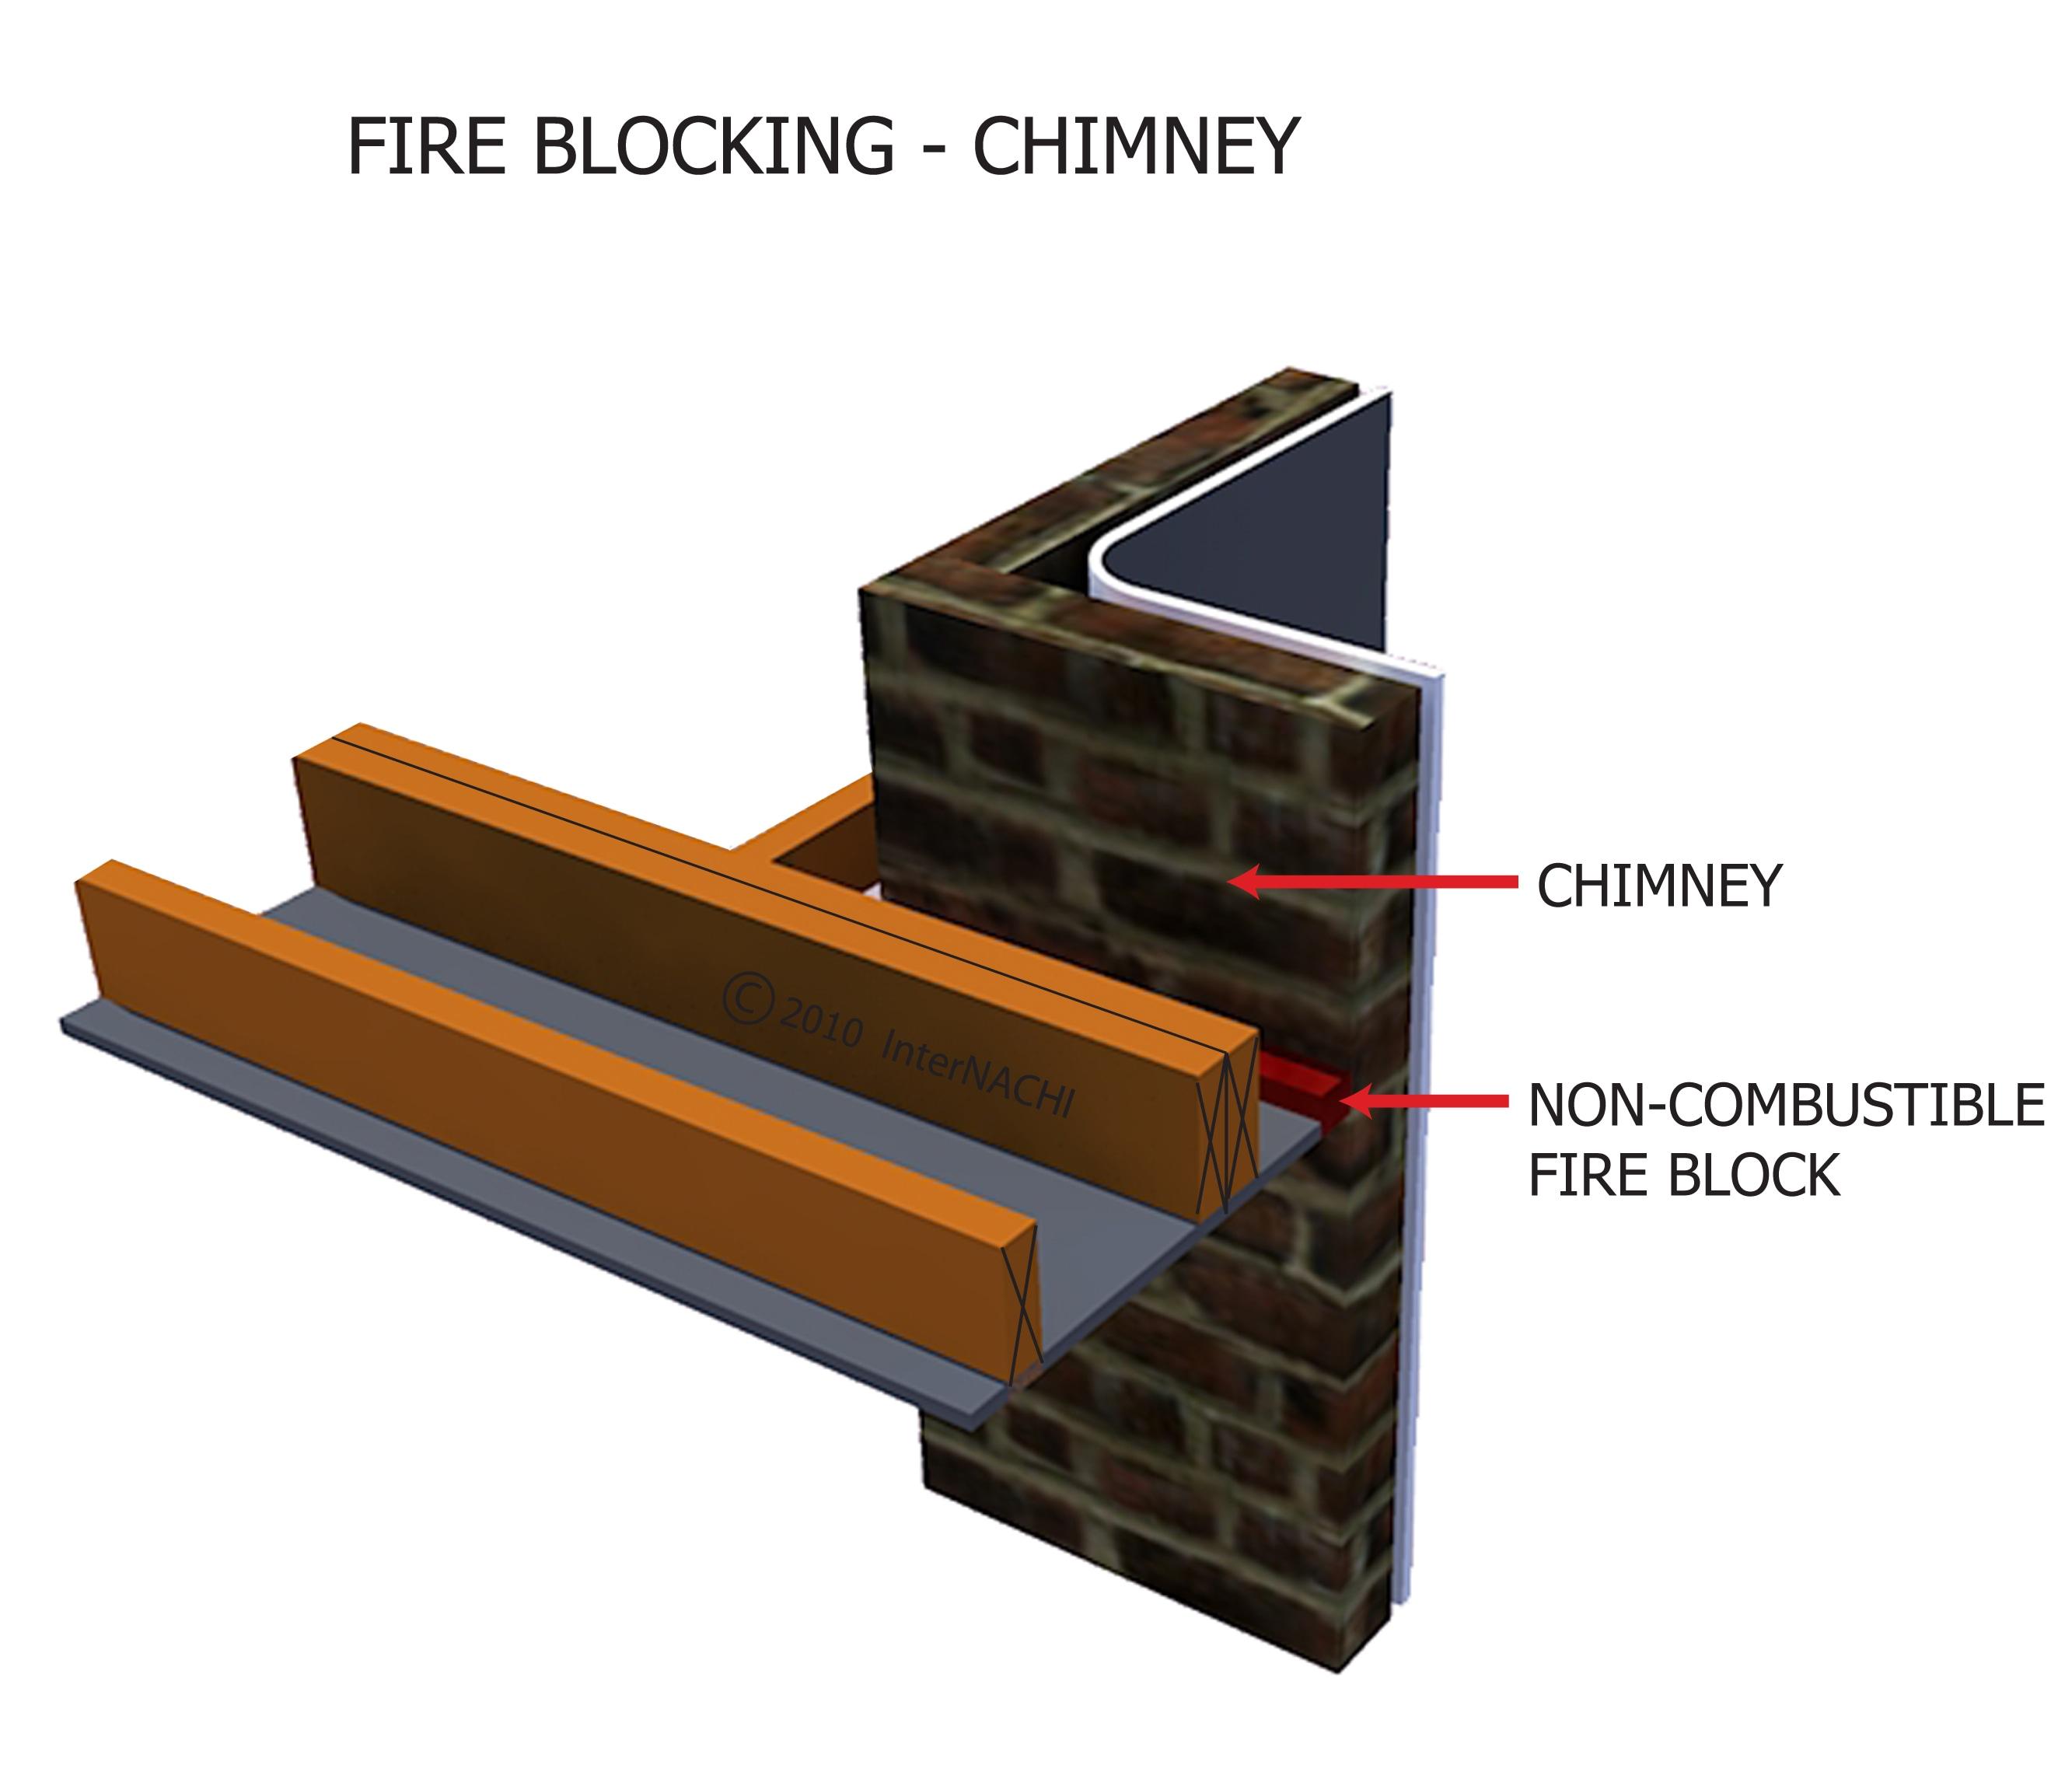 Fire blocking - chimney.